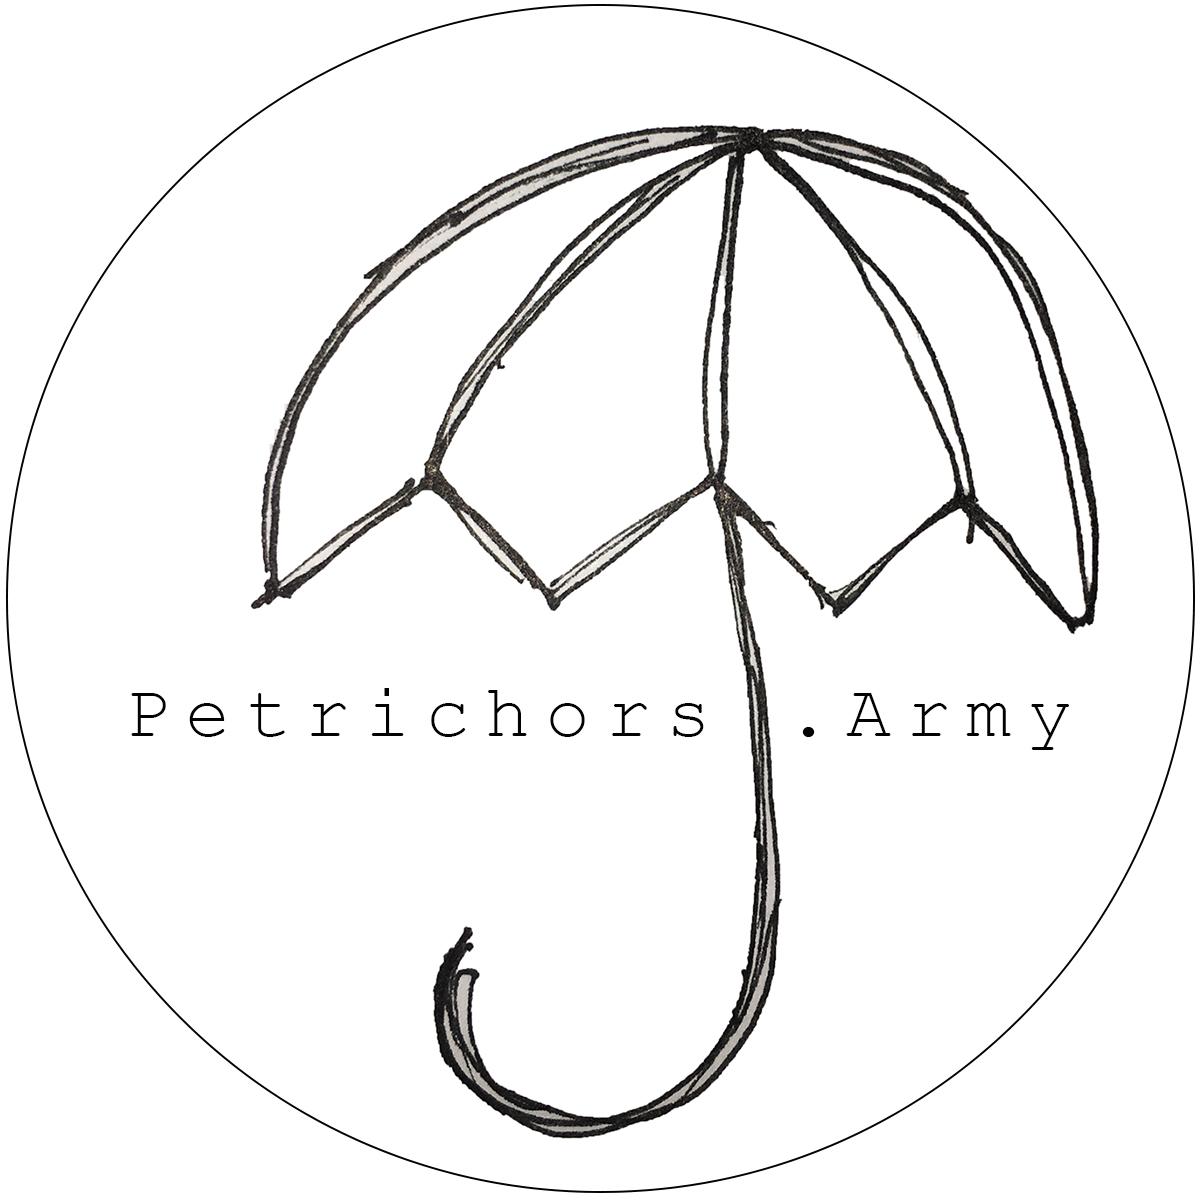 Petrichors Army